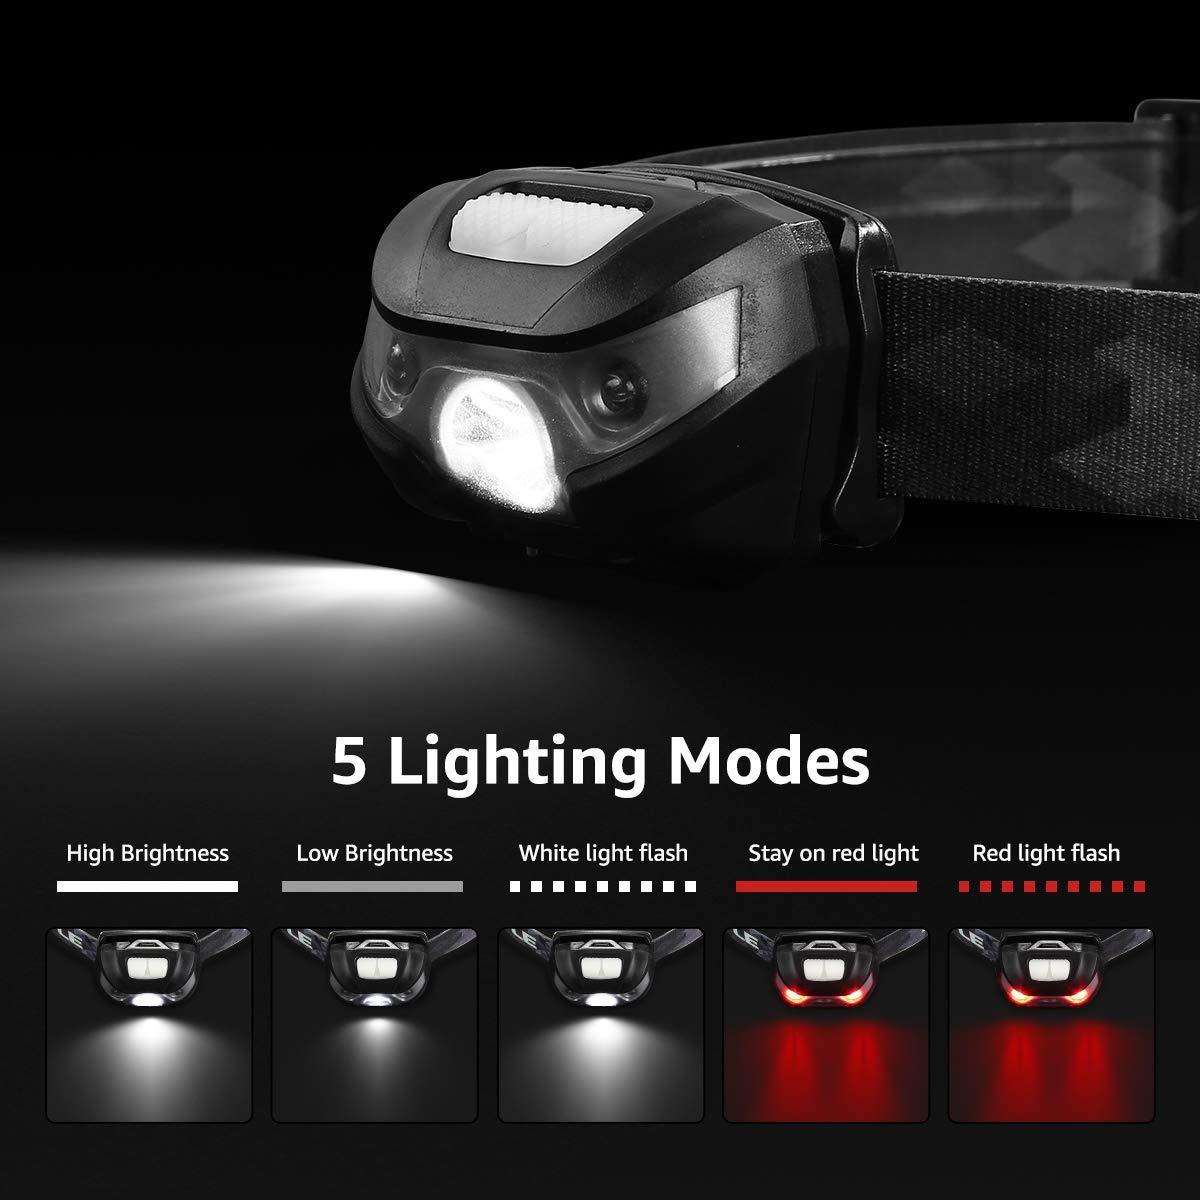 Running con Luz Roja Deporte Nocturno,Correr, 5 Modos De Luz Ligera El/ástica SHISOU Linterna Frontal USB Recargable para Ciclismo Clase De Eficiencia Energ/ética A+